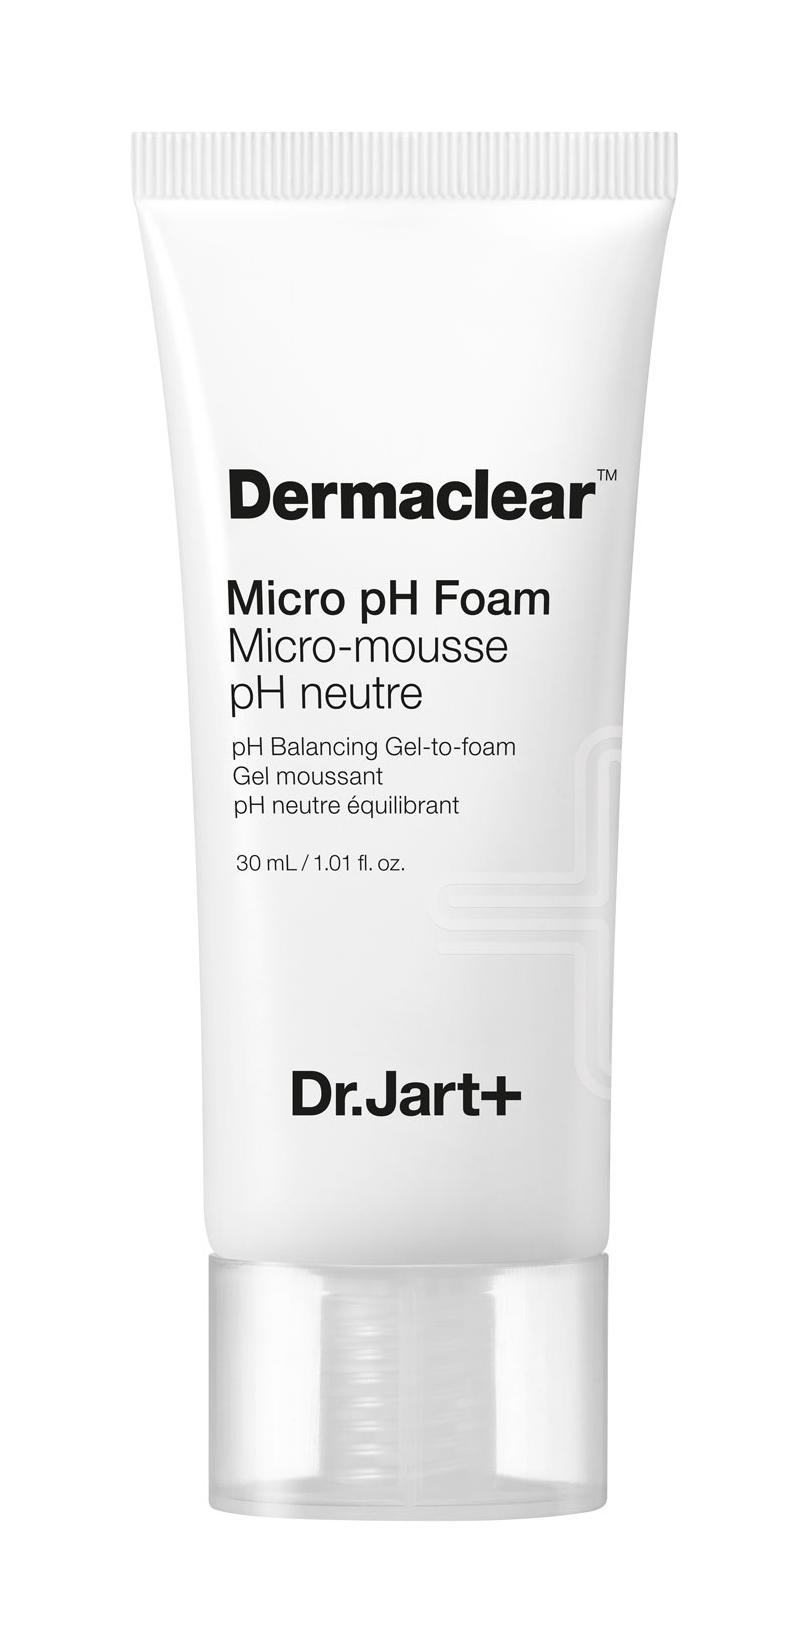 Dr.Jart+ Гель-Пенка Dermaclear Micro pH Foam для Умывания Глубокого Очищения PH 5.5, 30 мл